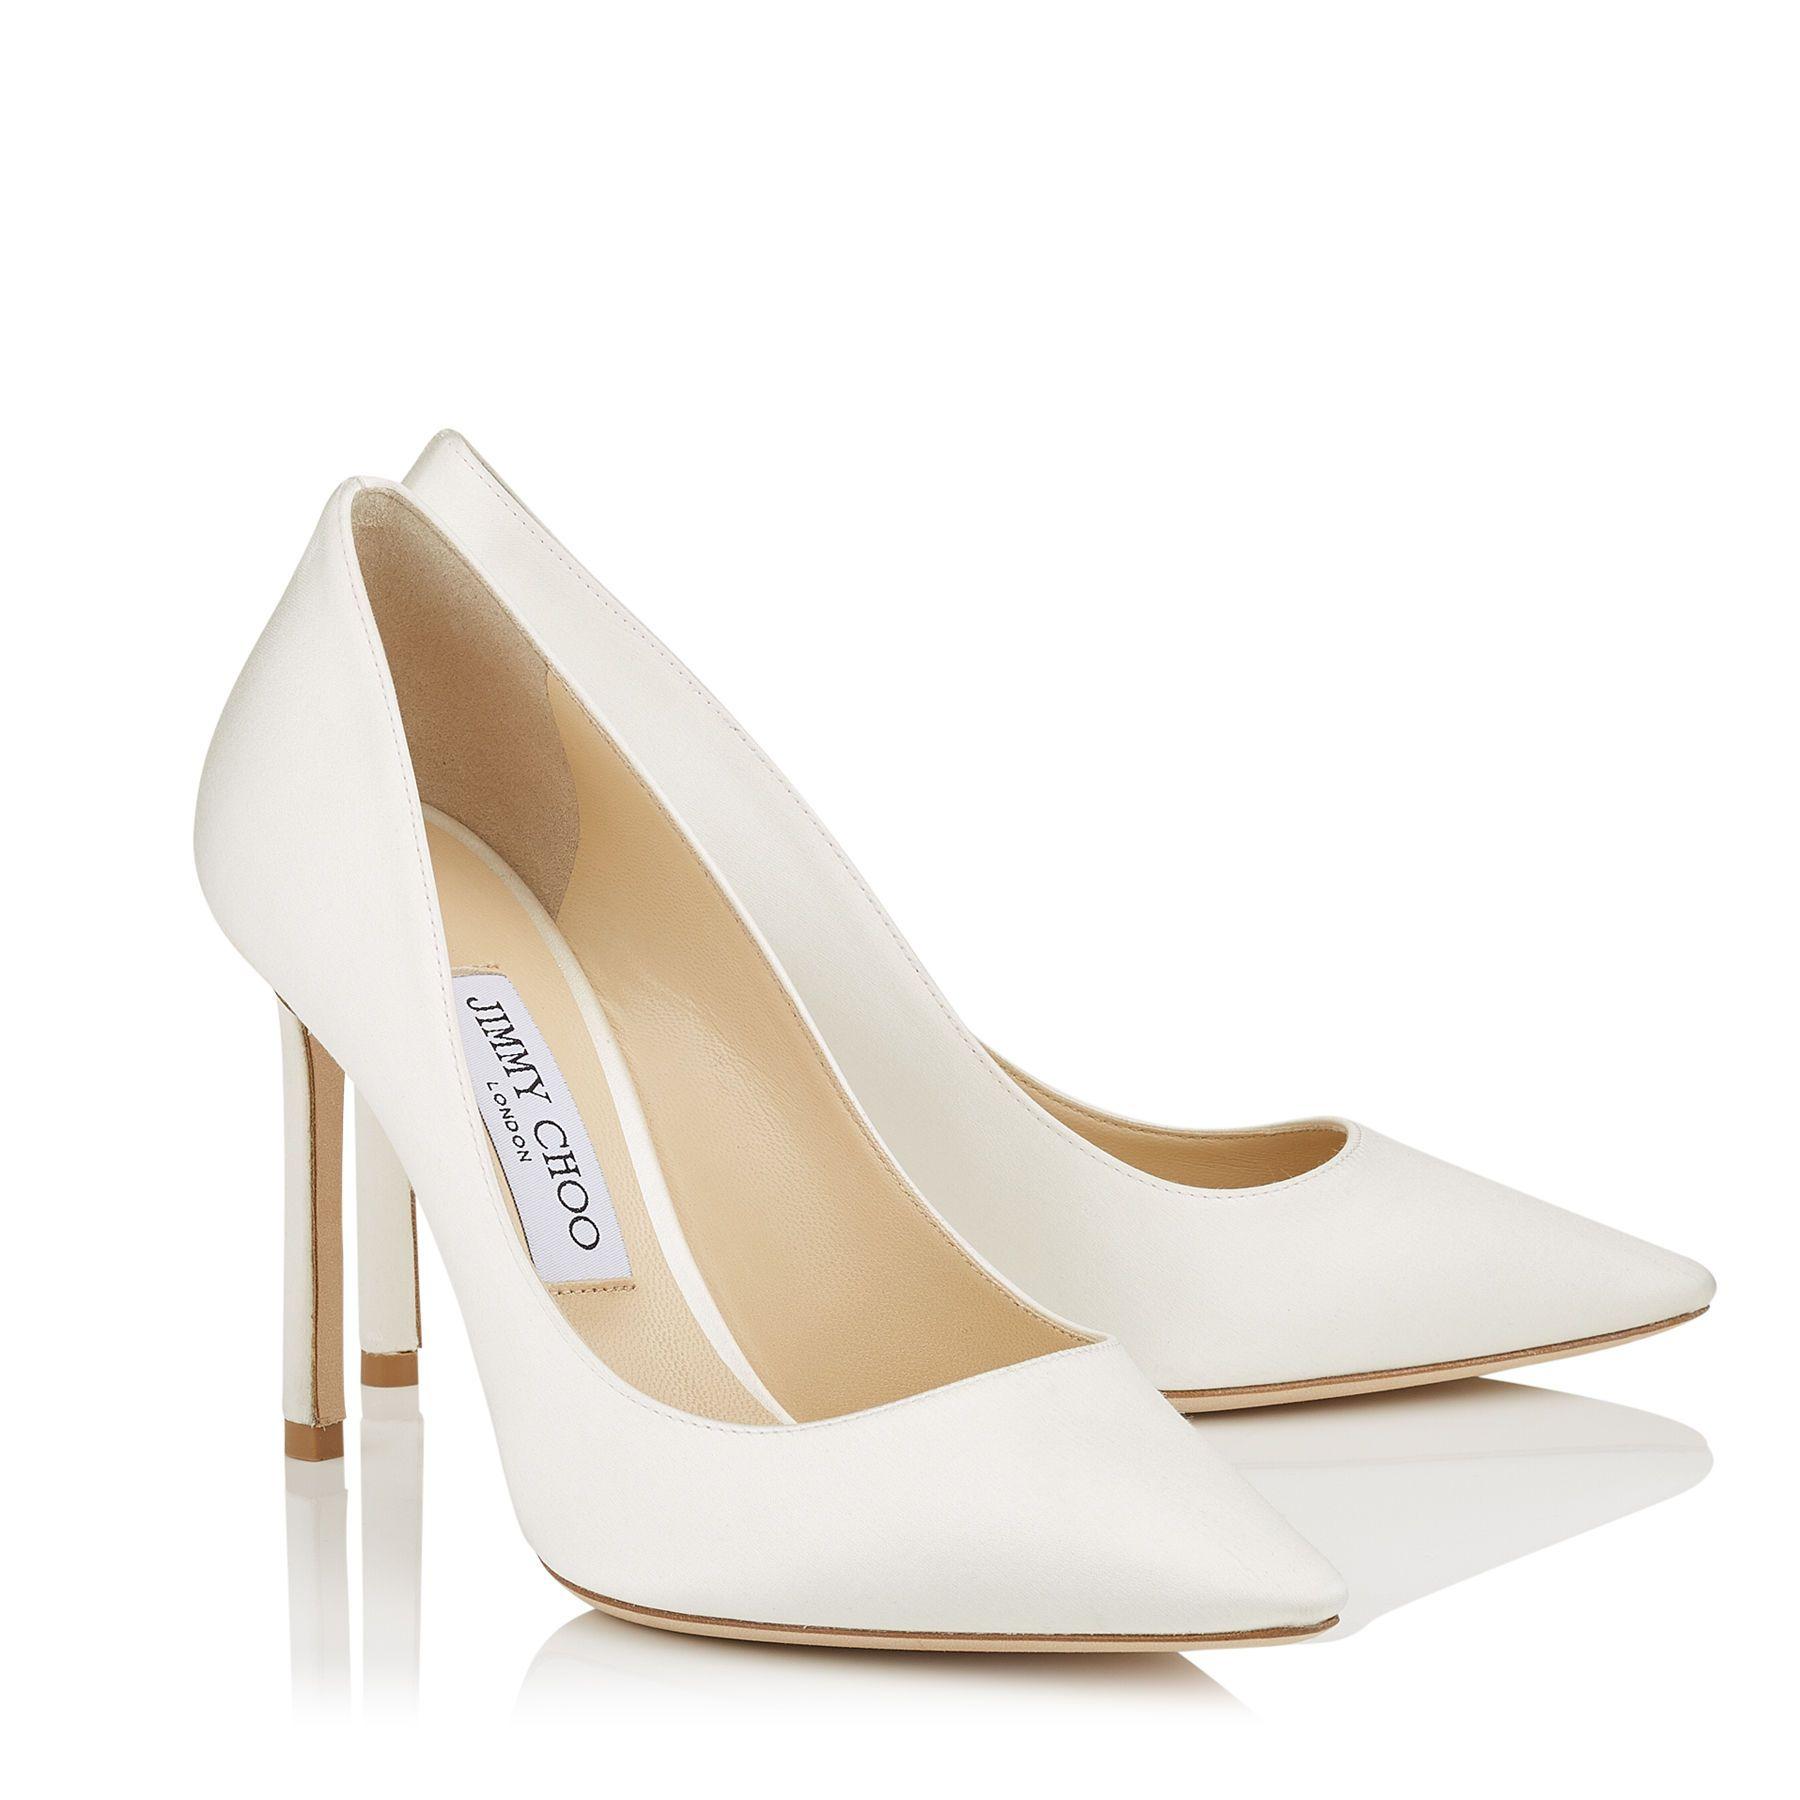 ROMY 100   Wedding shoes white pumps